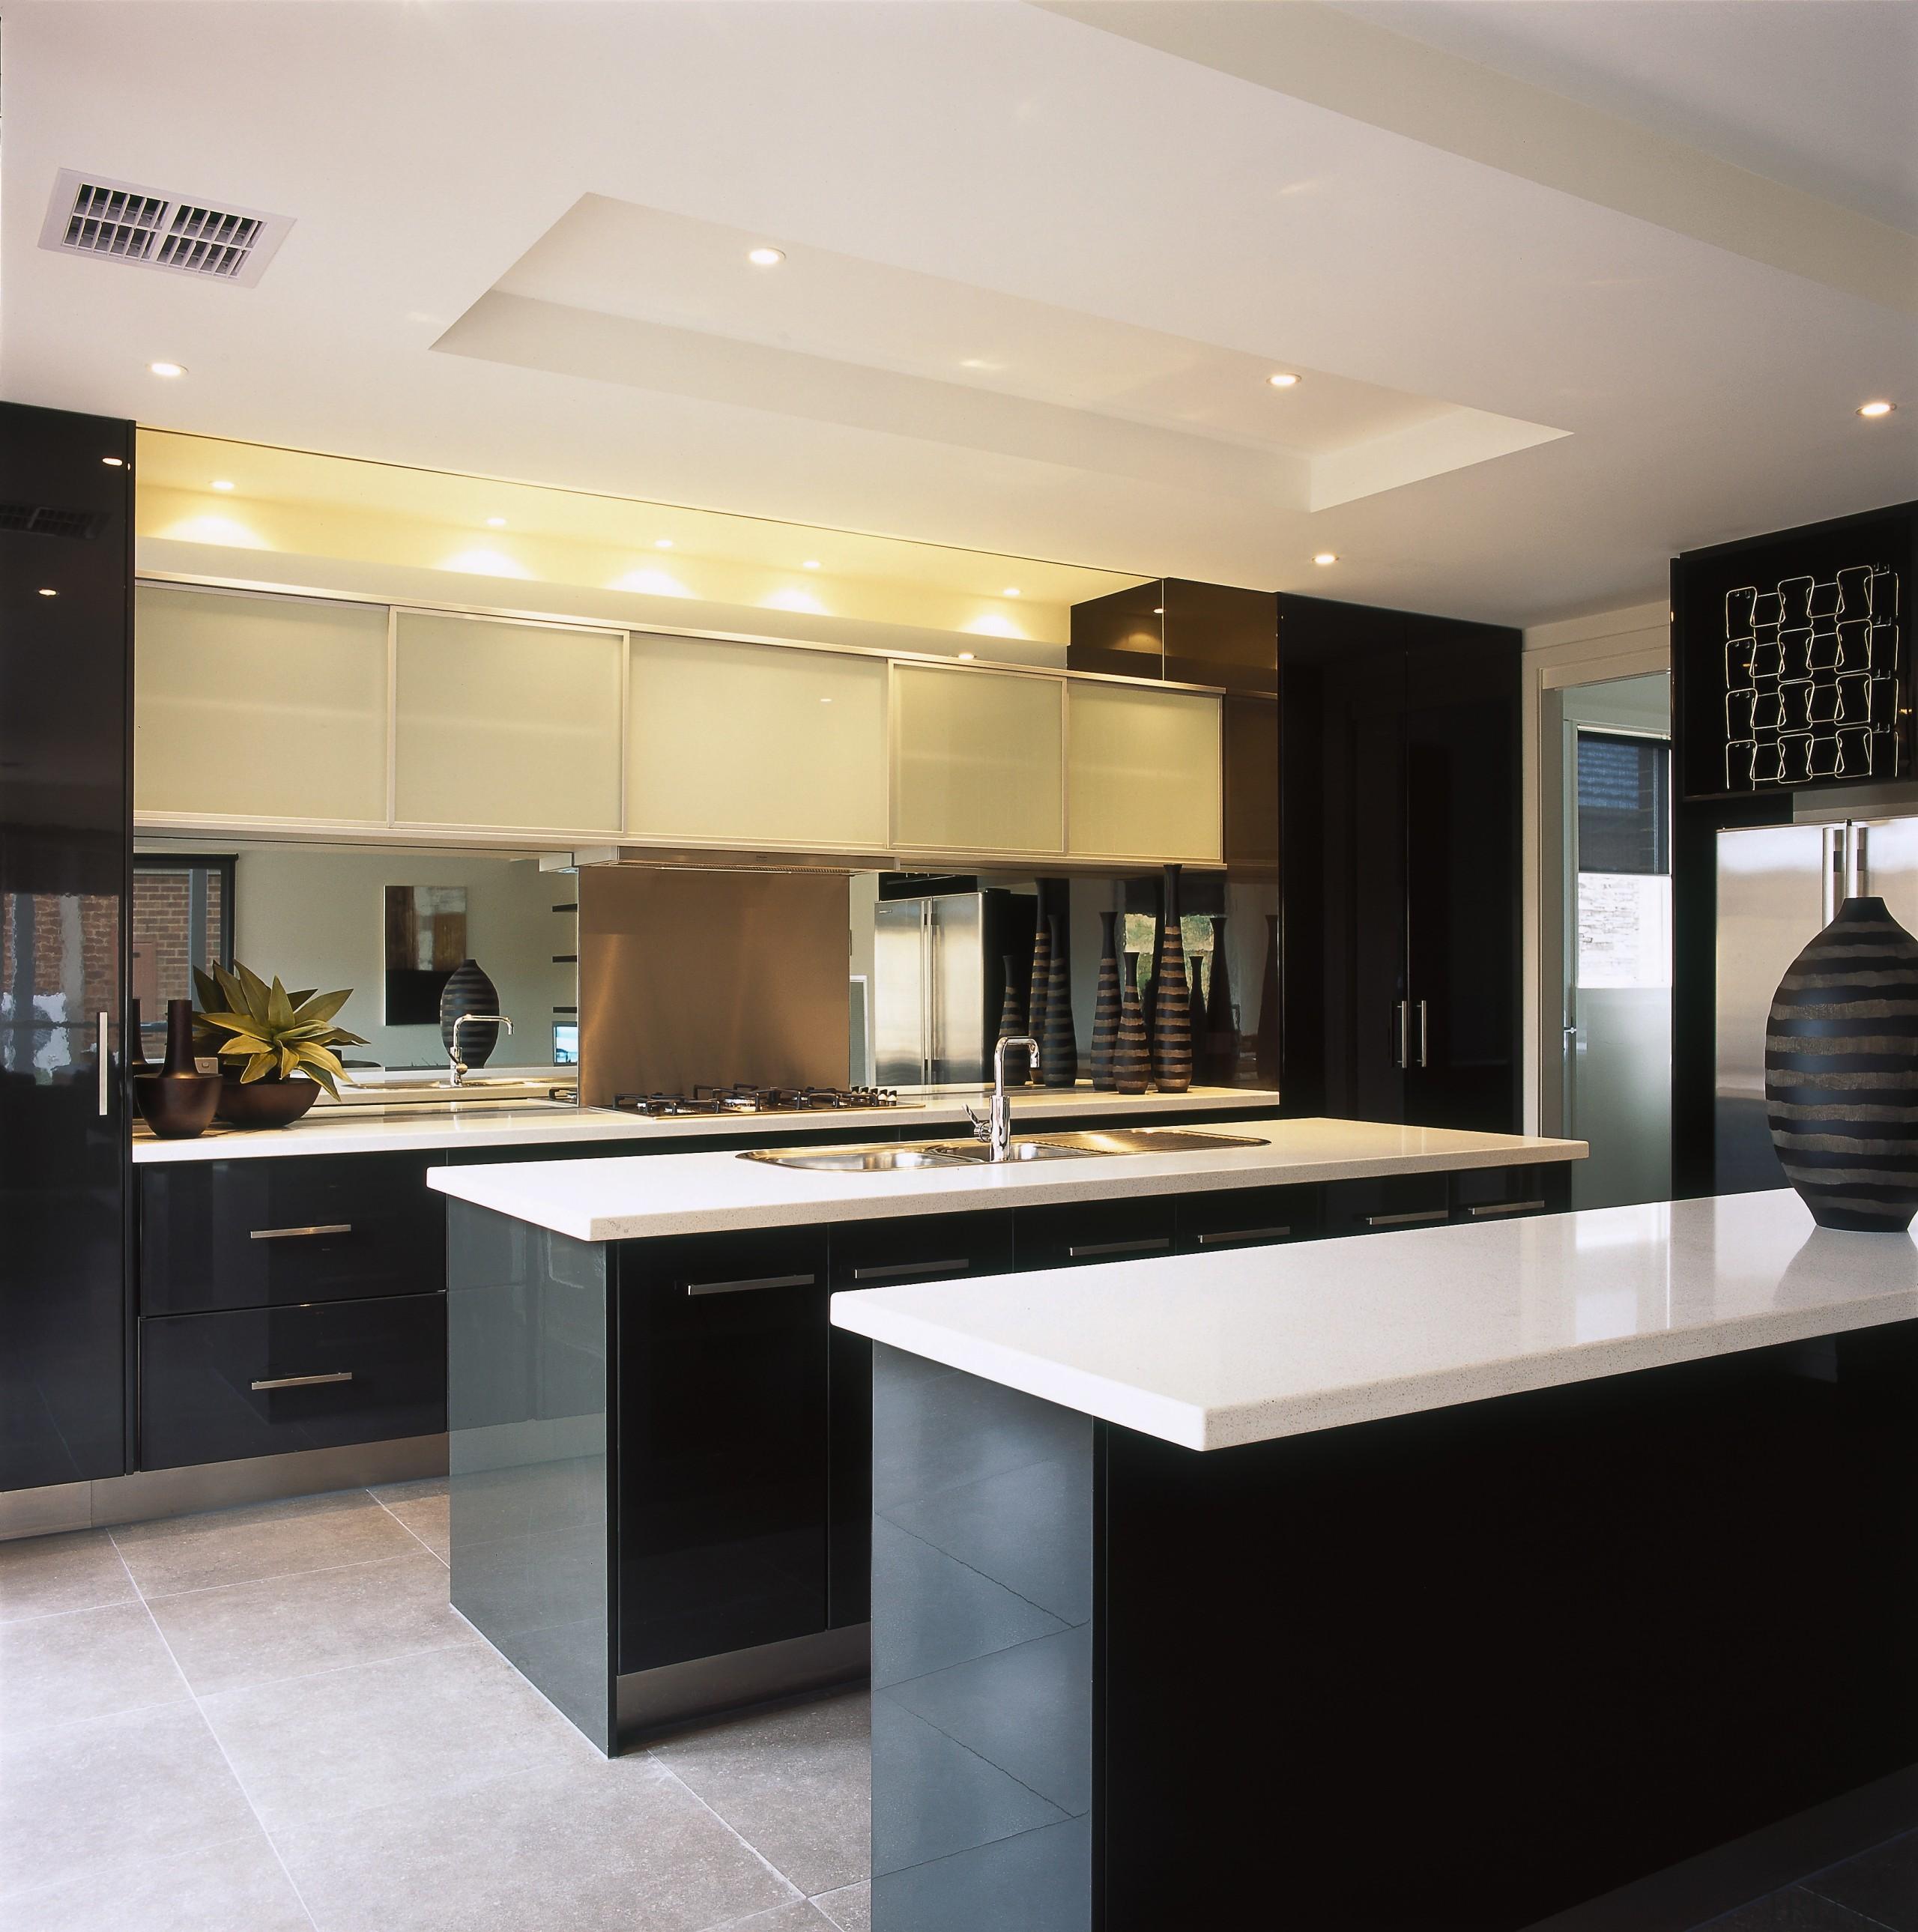 interior view of kitchen area - interior view cabinetry, ceiling, countertop, cuisine classique, interior design, kitchen, gray, black